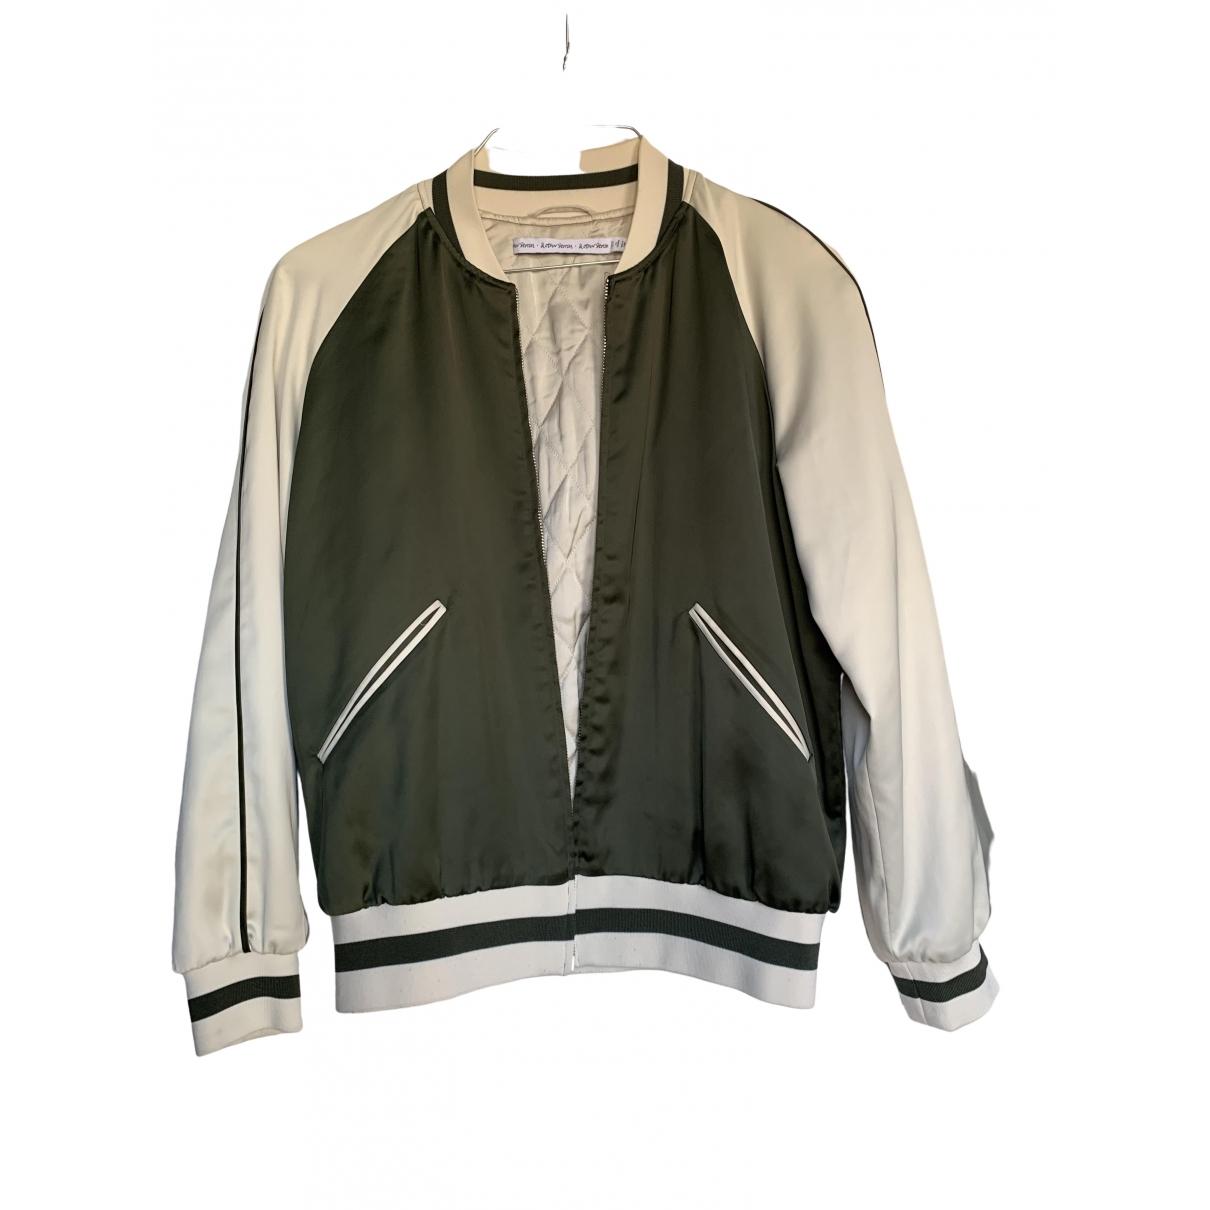 & Stories \N Green jacket for Women 34 FR